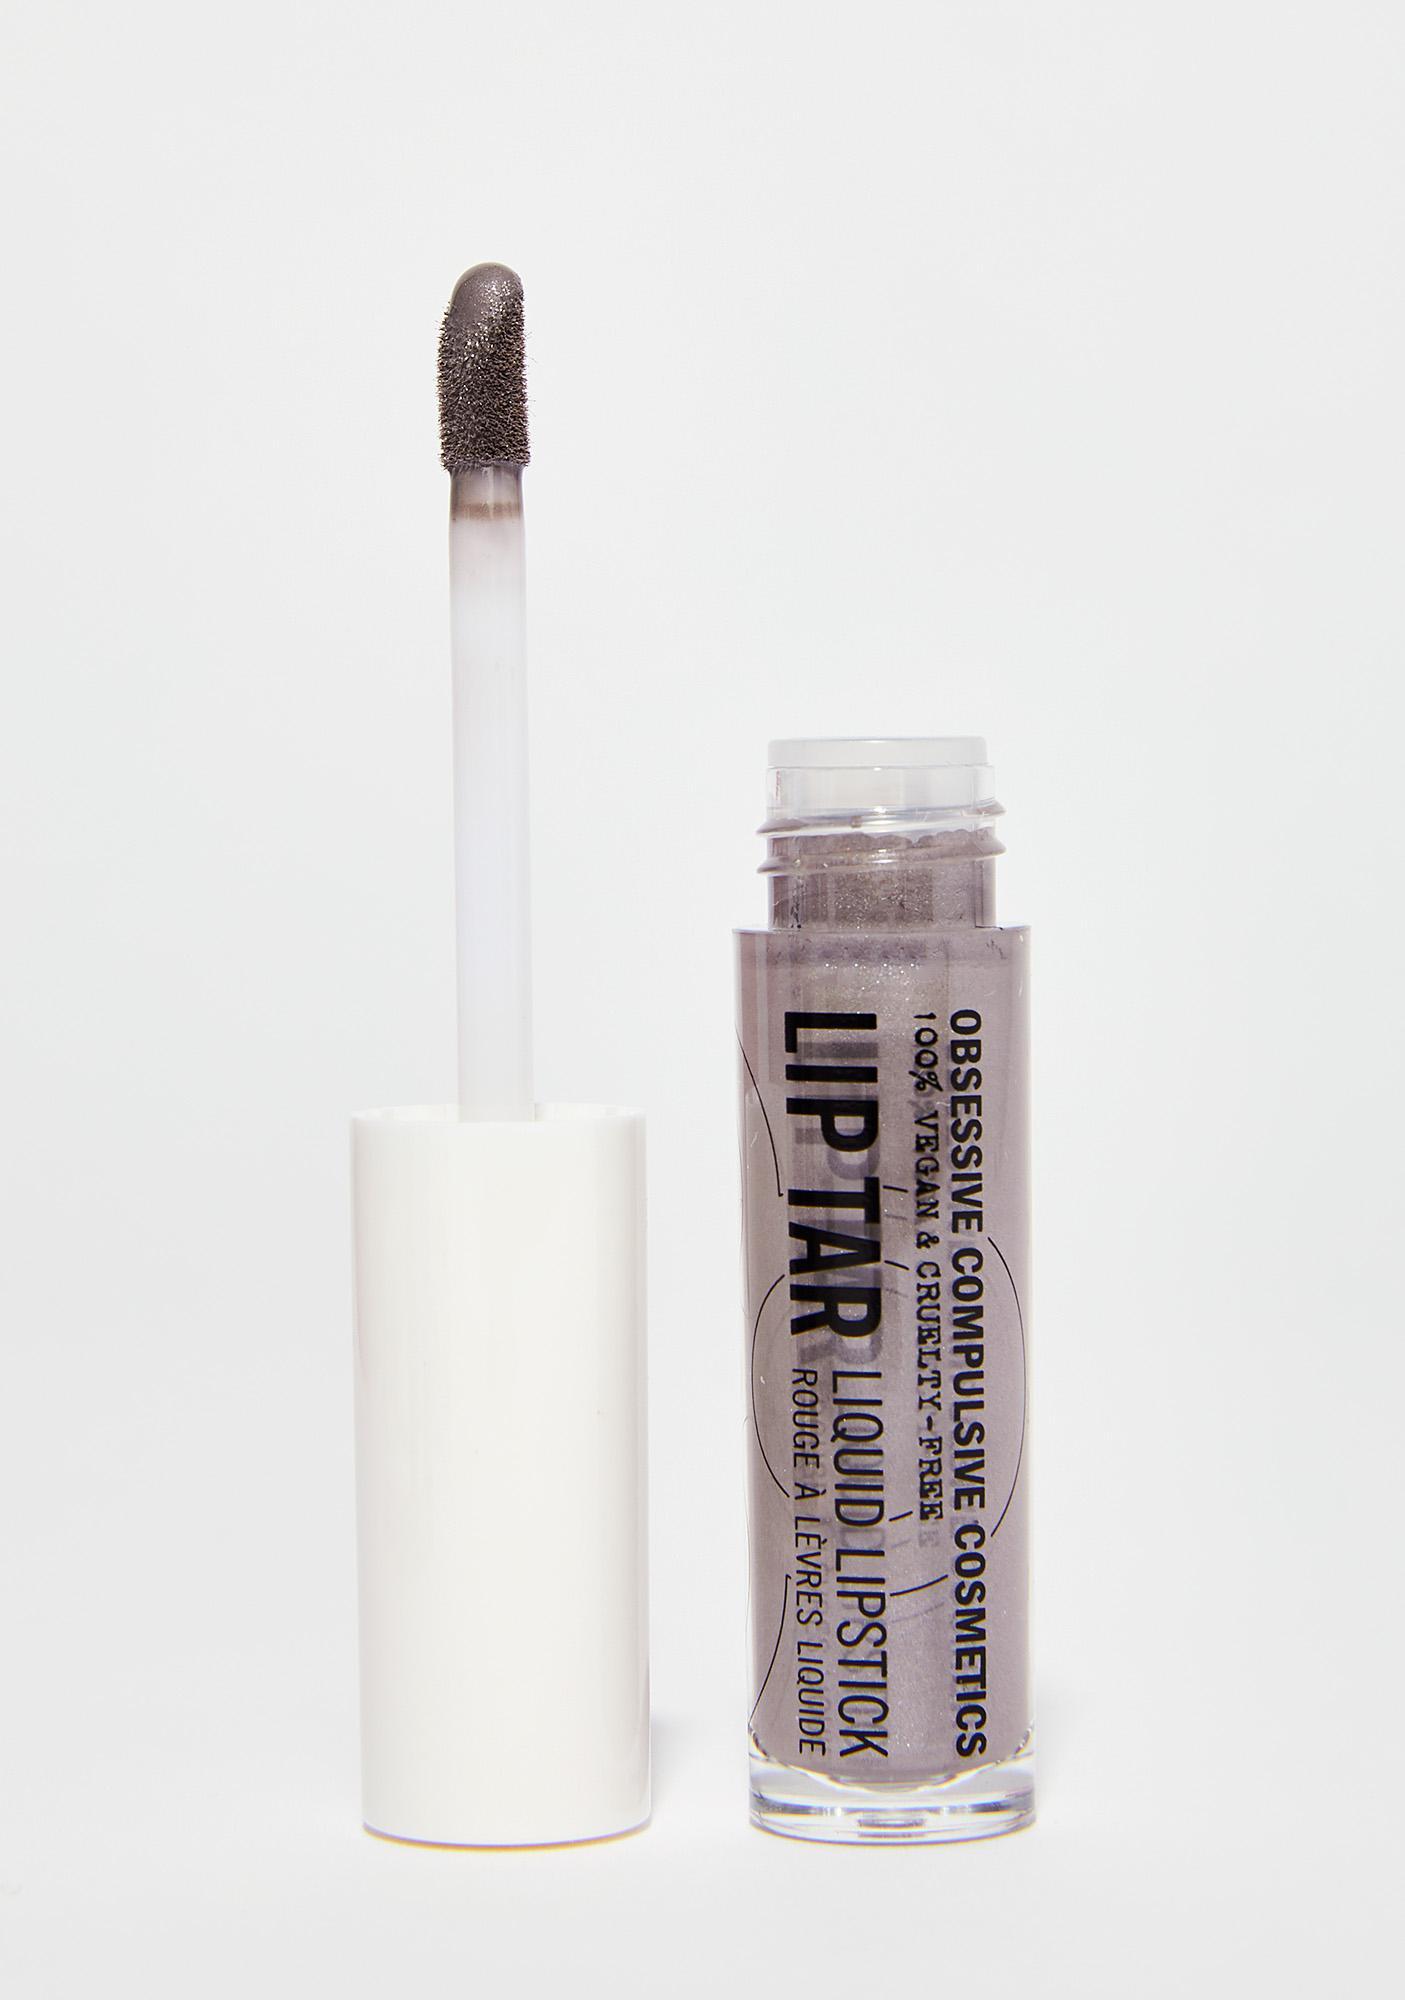 Obsessive Compulsive Cosmetics Quicksilver Lip Tar